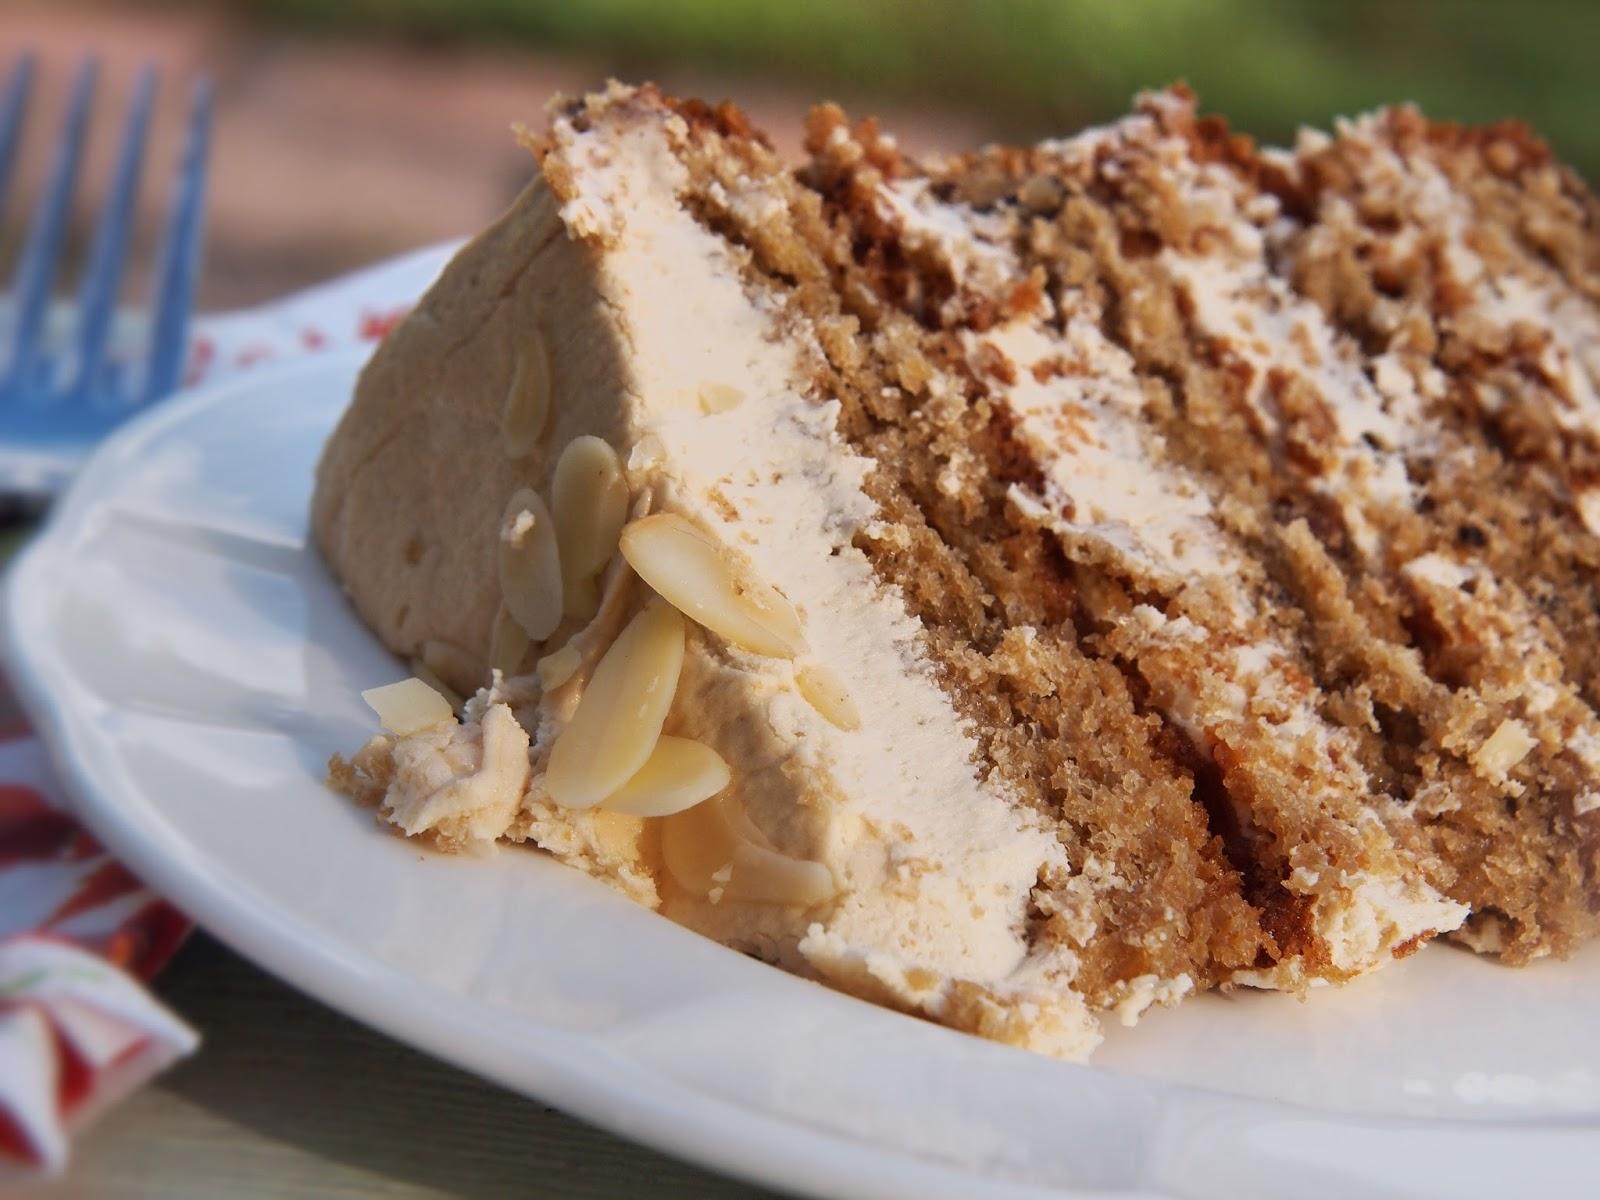 Almond layer cake recipe from scratch